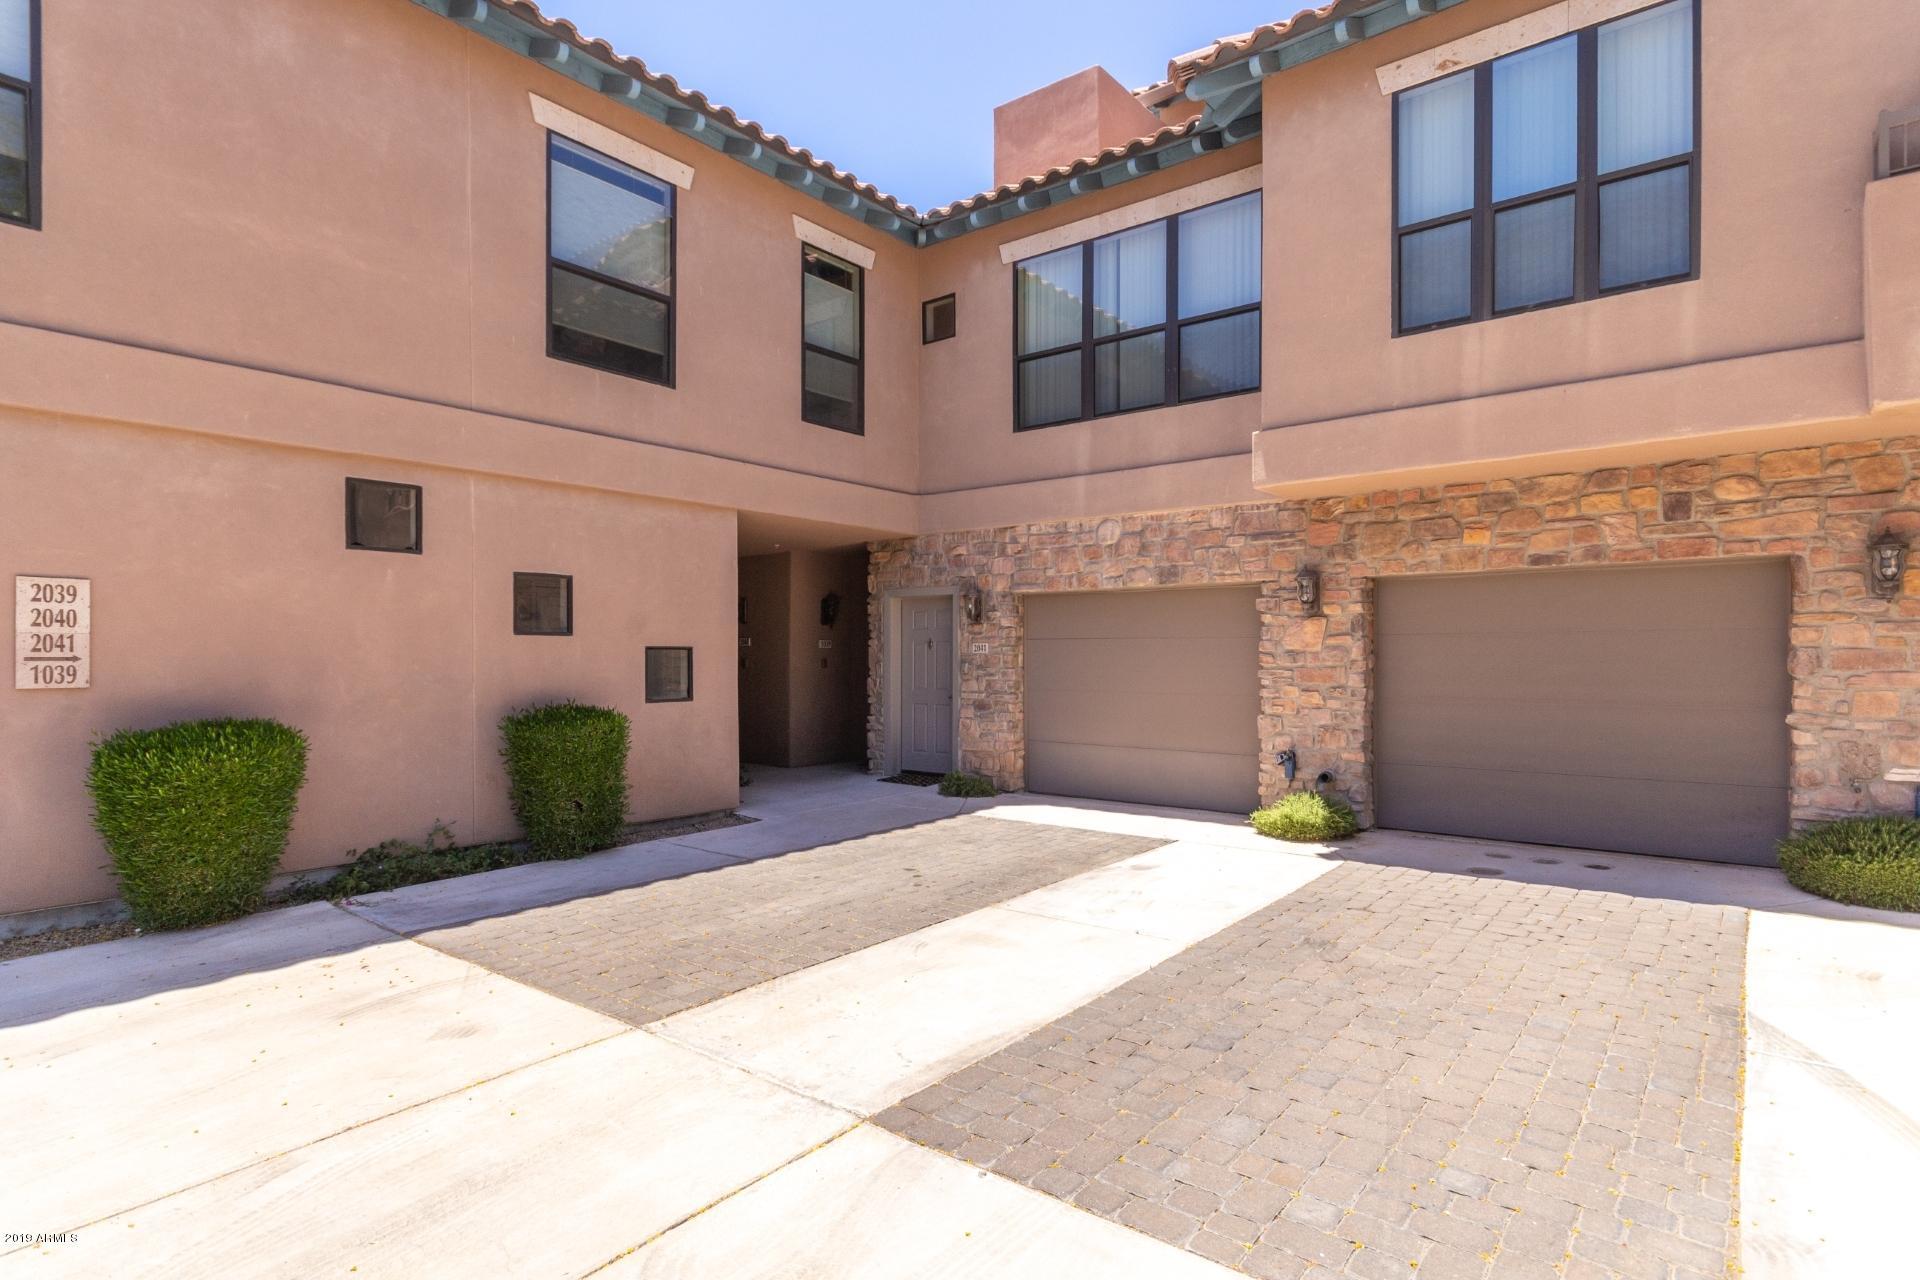 Photo of 20660 N 40TH Street #2041, Phoenix, AZ 85050